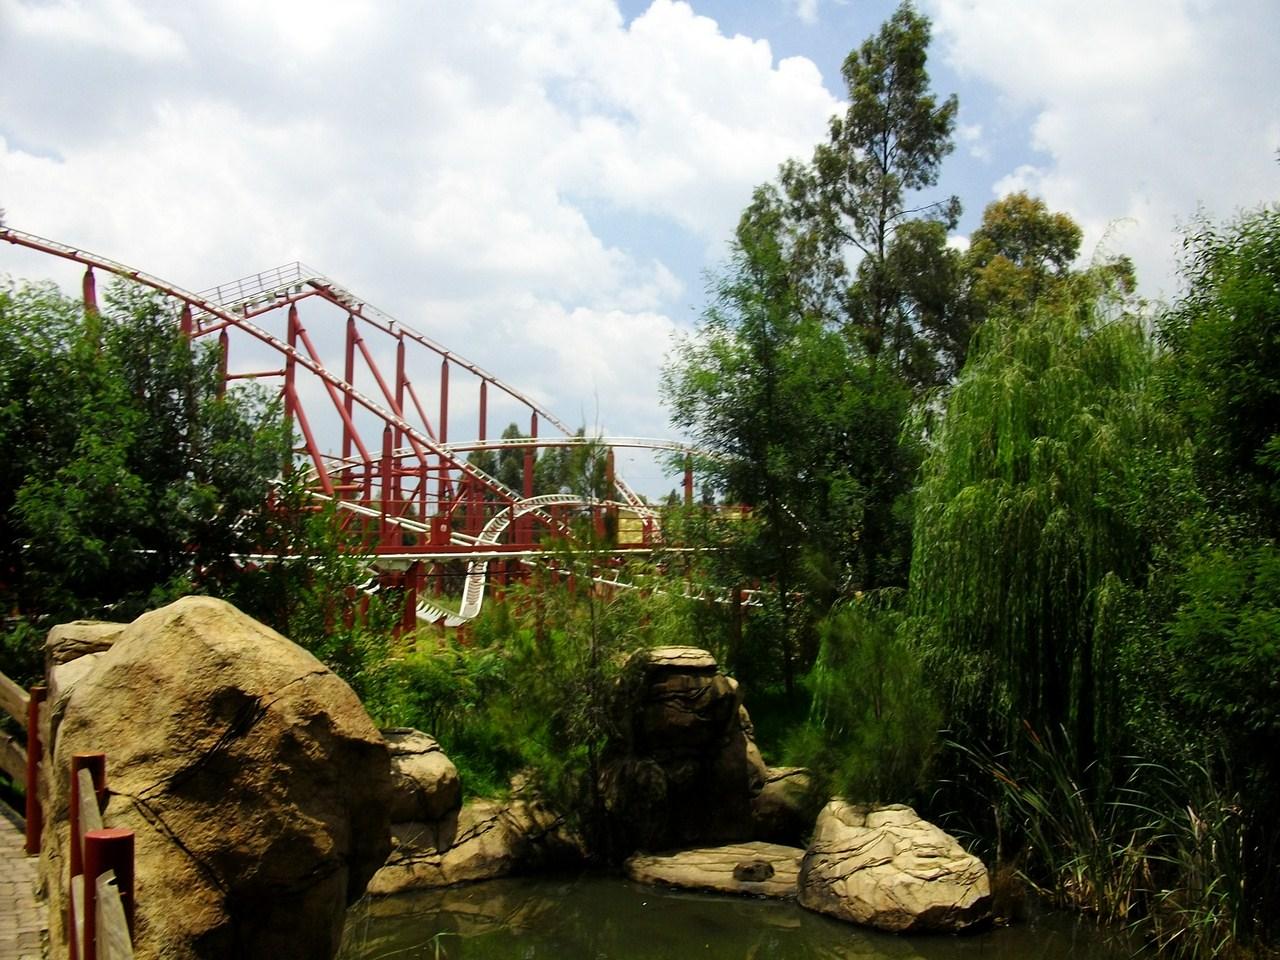 Re: Gold Reef City Theme Park